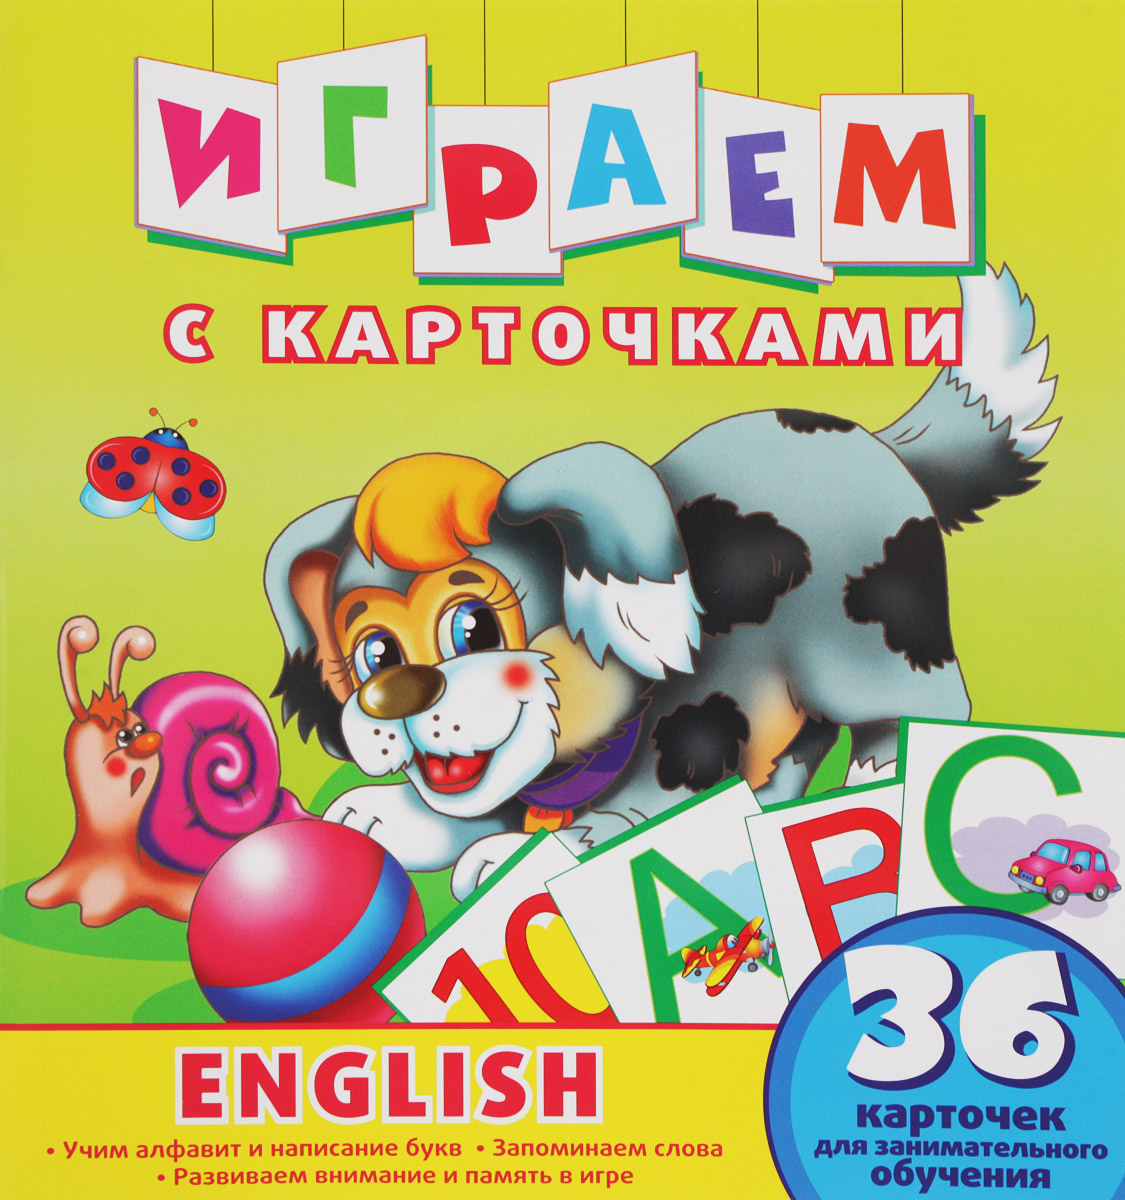 English #1